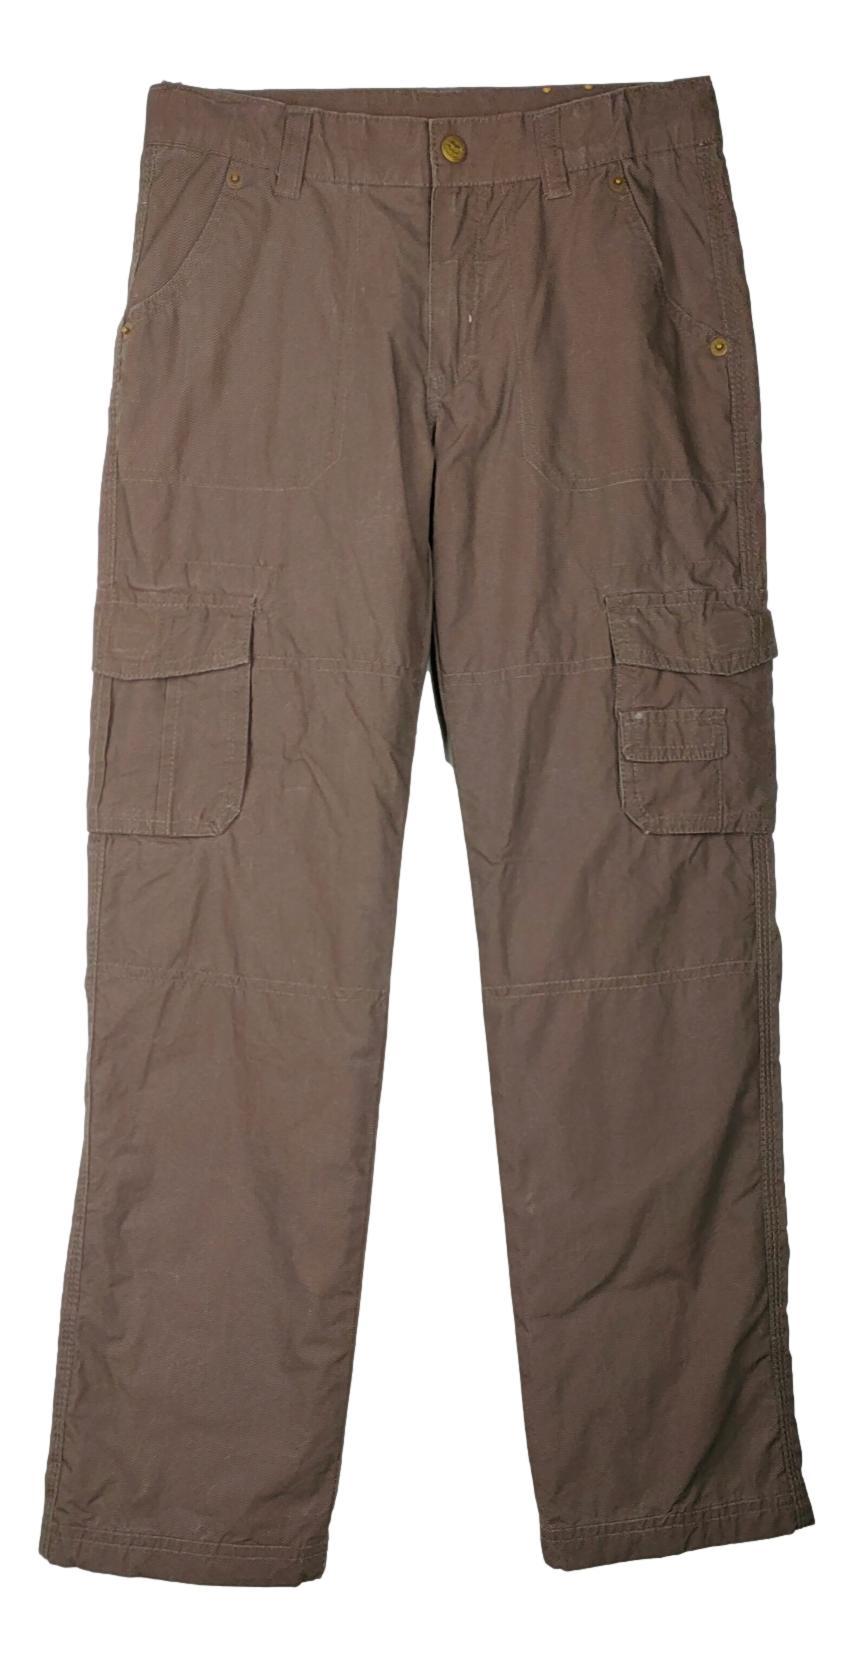 Pantalon  Sergent Major - Taille 10 ans